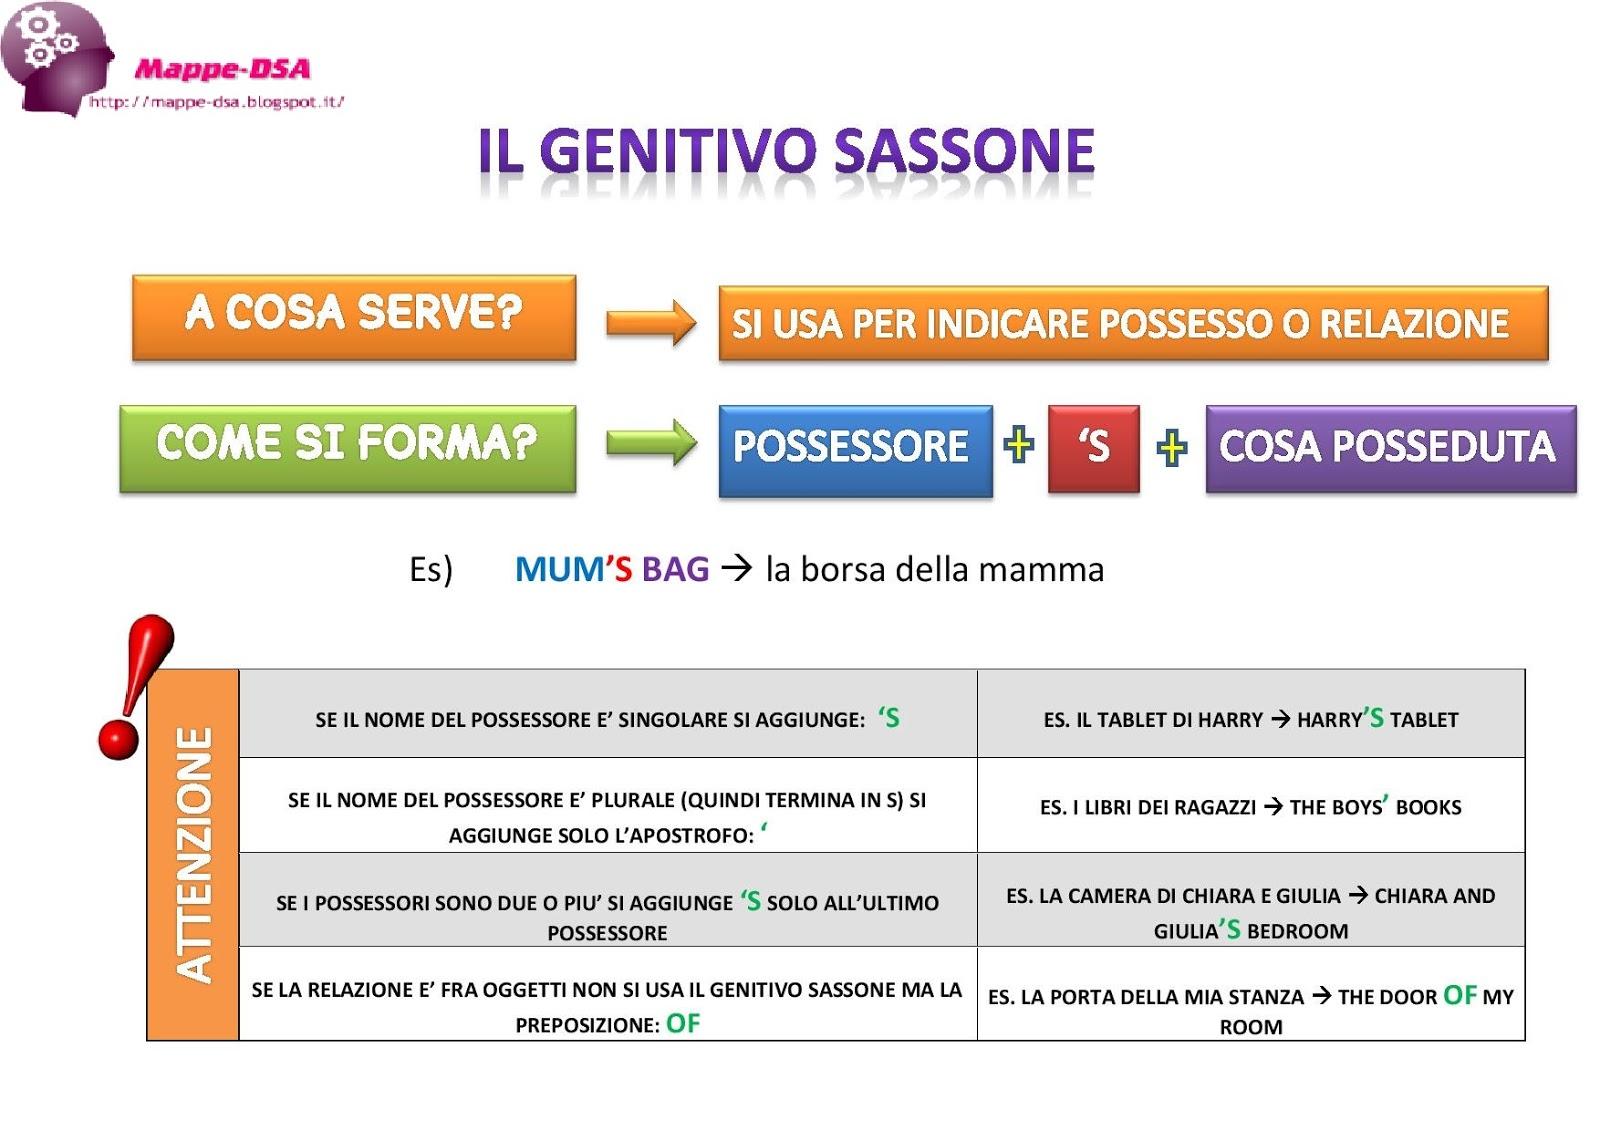 Popolare GENITIVO+SASSONE.jpg OM96